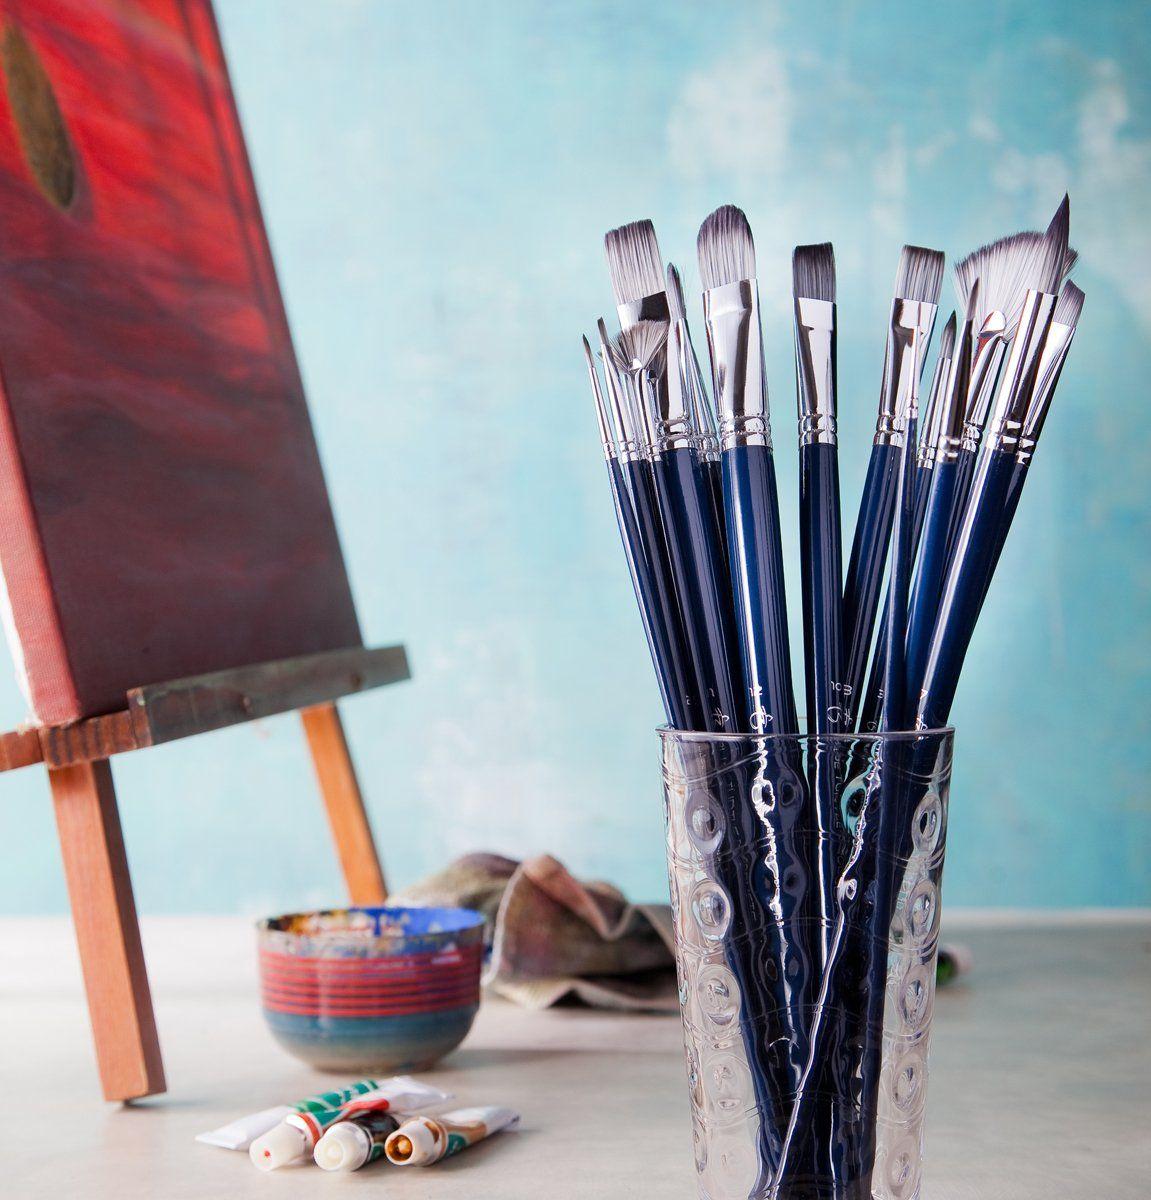 Blue turtle products 16 piece artist paint brush set for